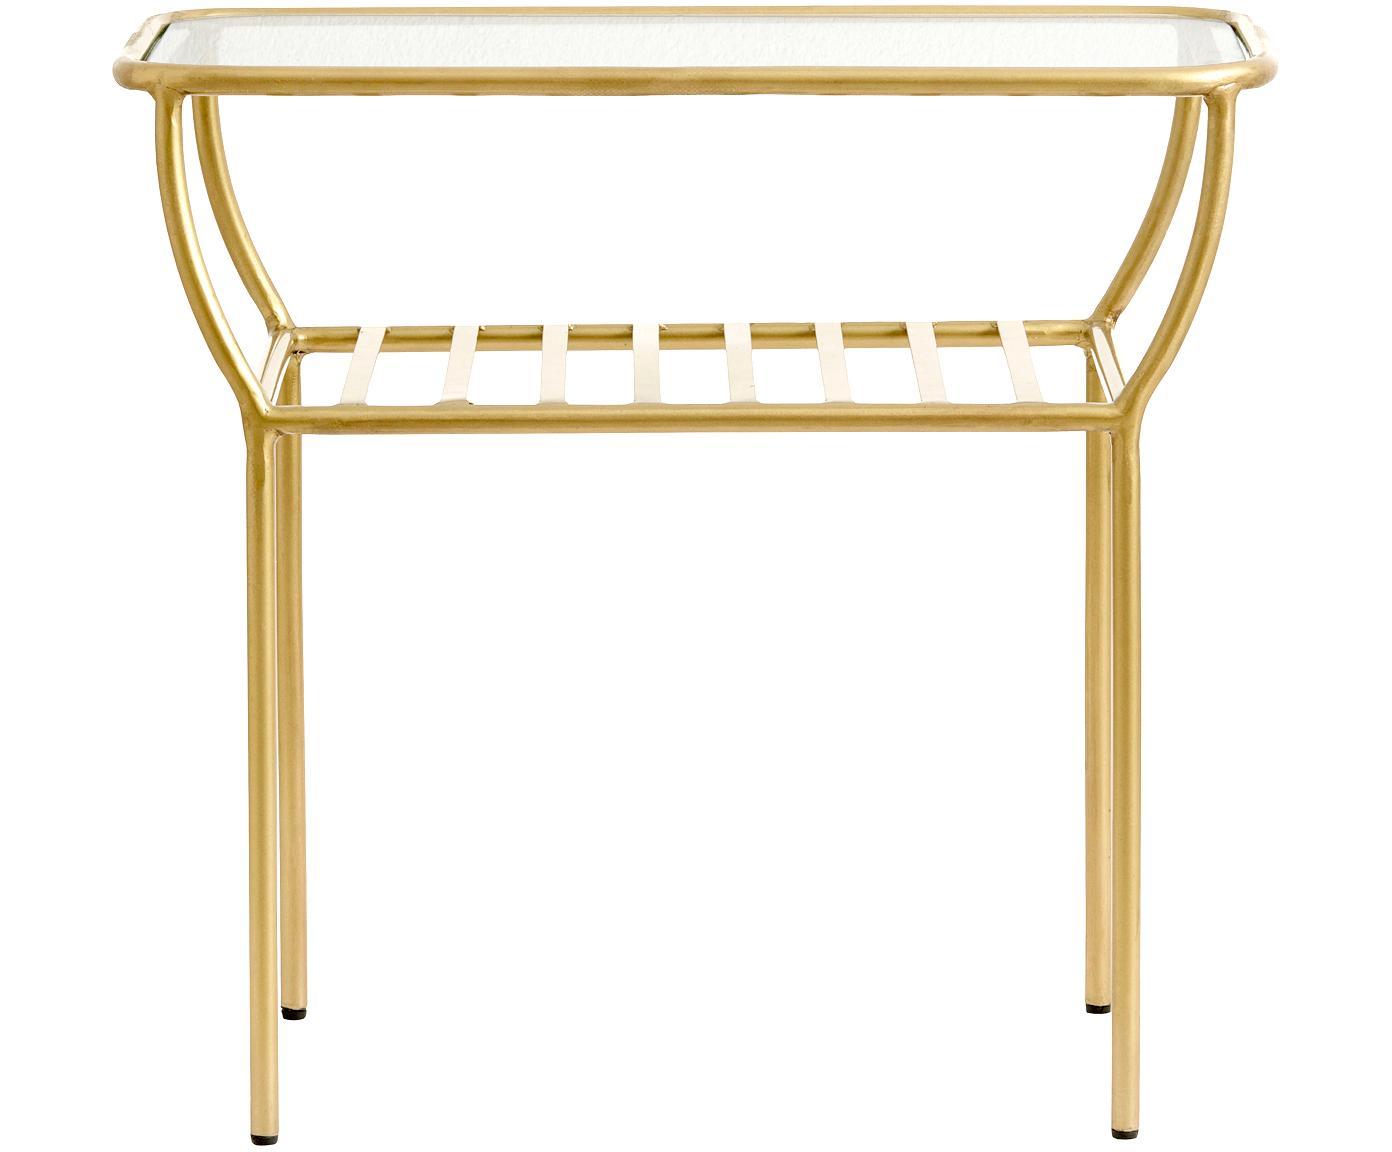 Mesa auxiliar Maeve, tablero de cristal, Tablero: vidrio, Estructura: metal, pintado, Latón, An 50 x Al 45 cm